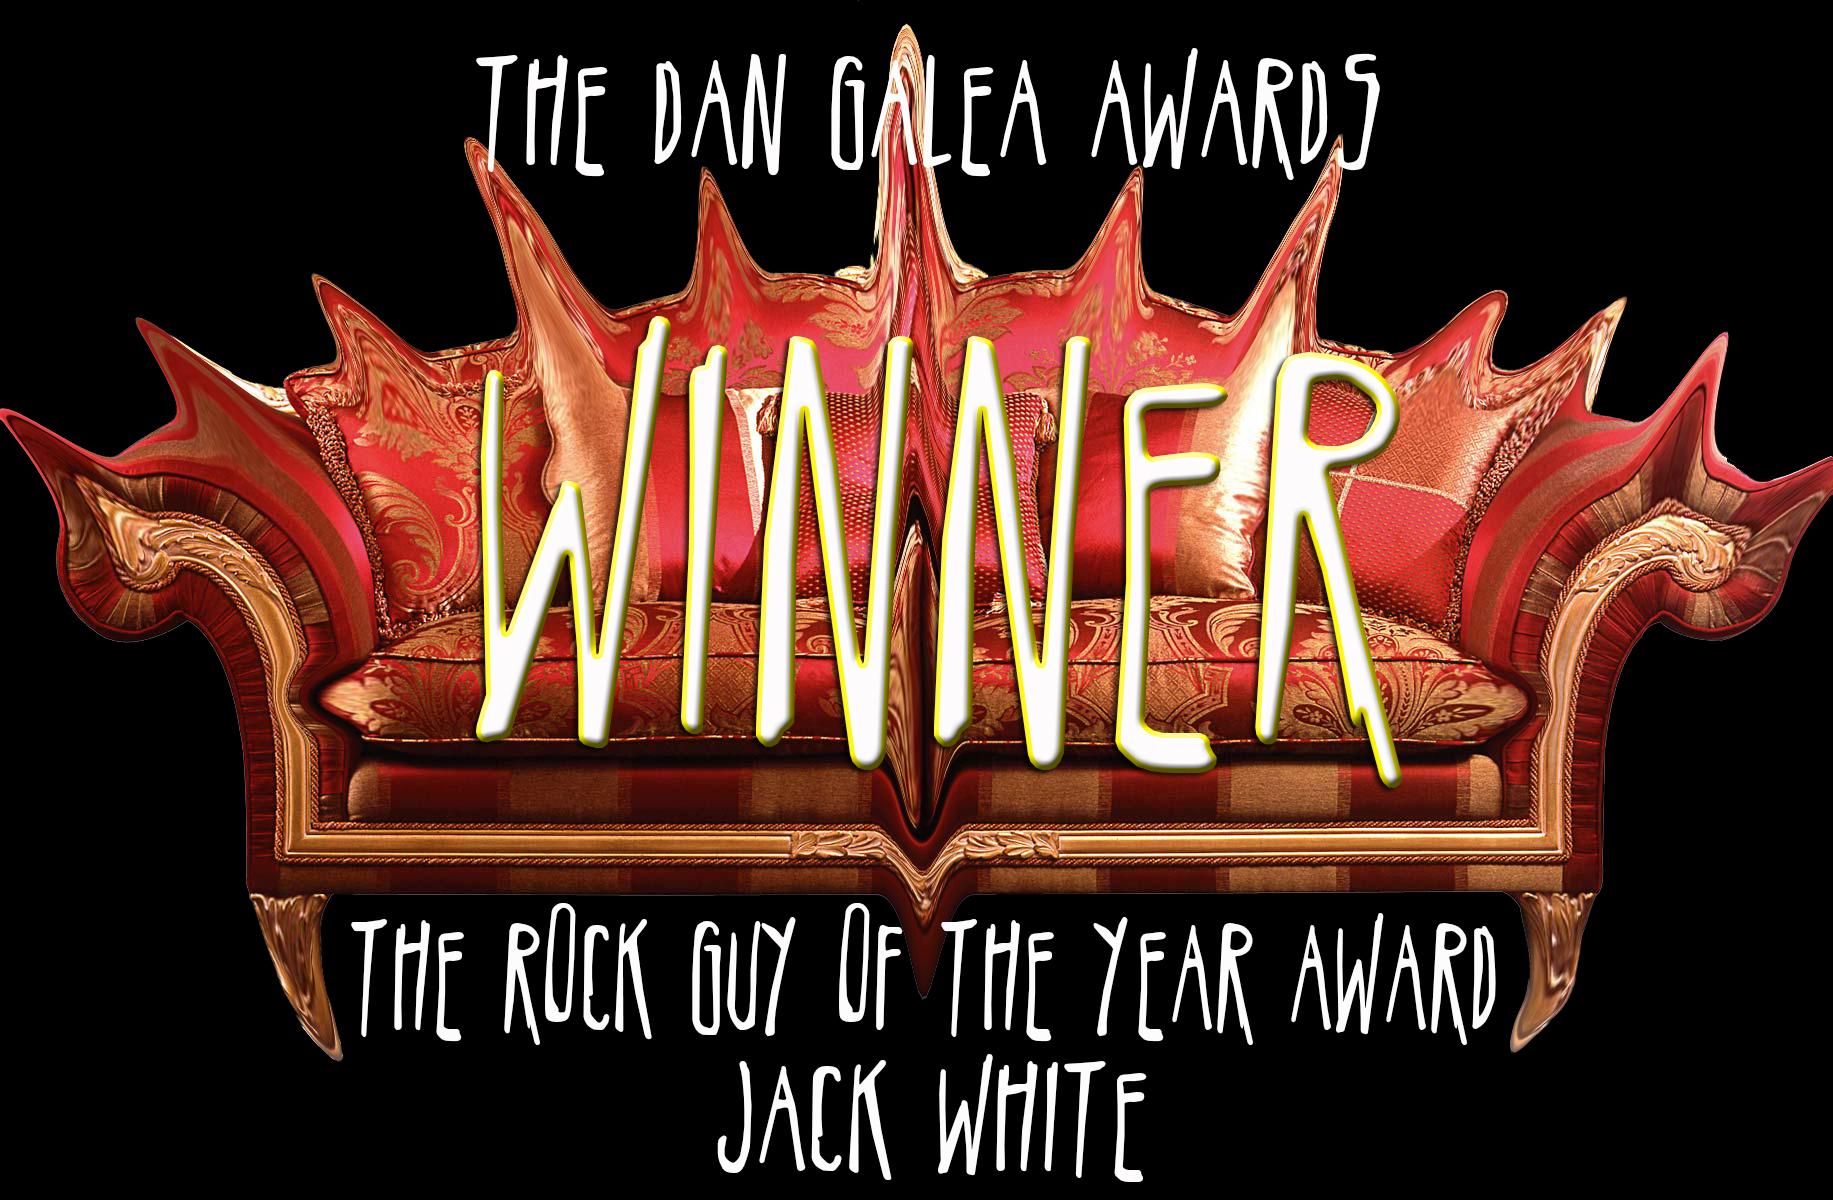 DGAWARDS Jack White.jpg